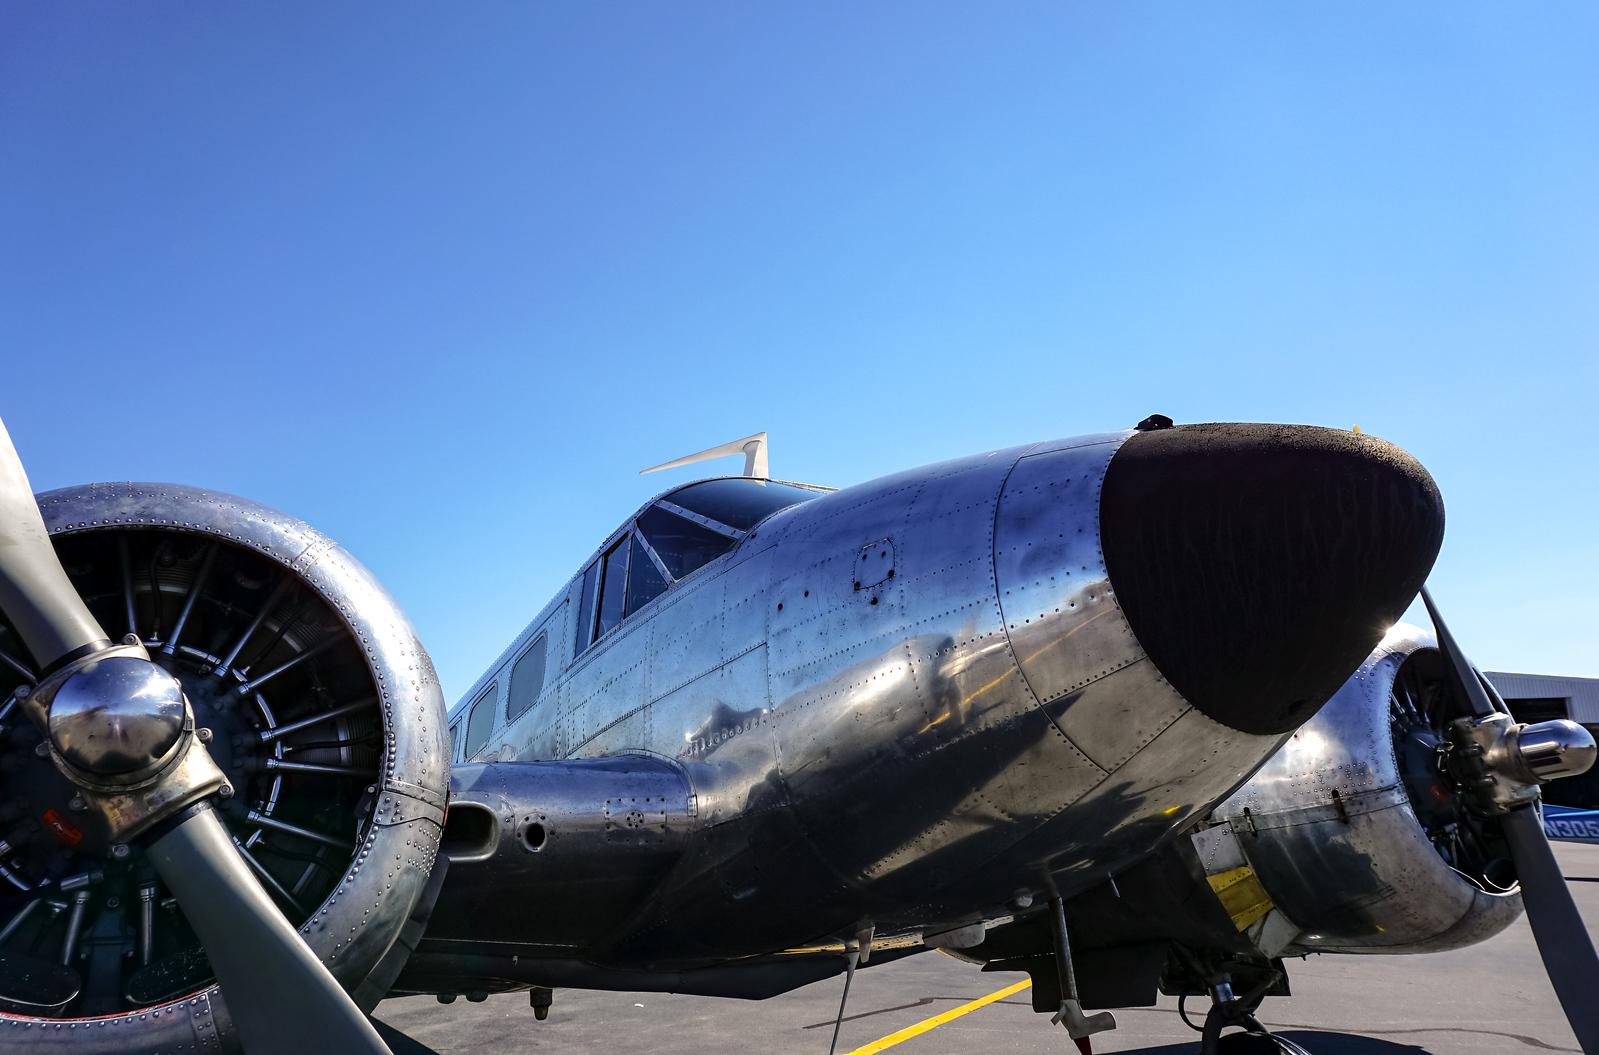 1342 - Airport - Silver Plane